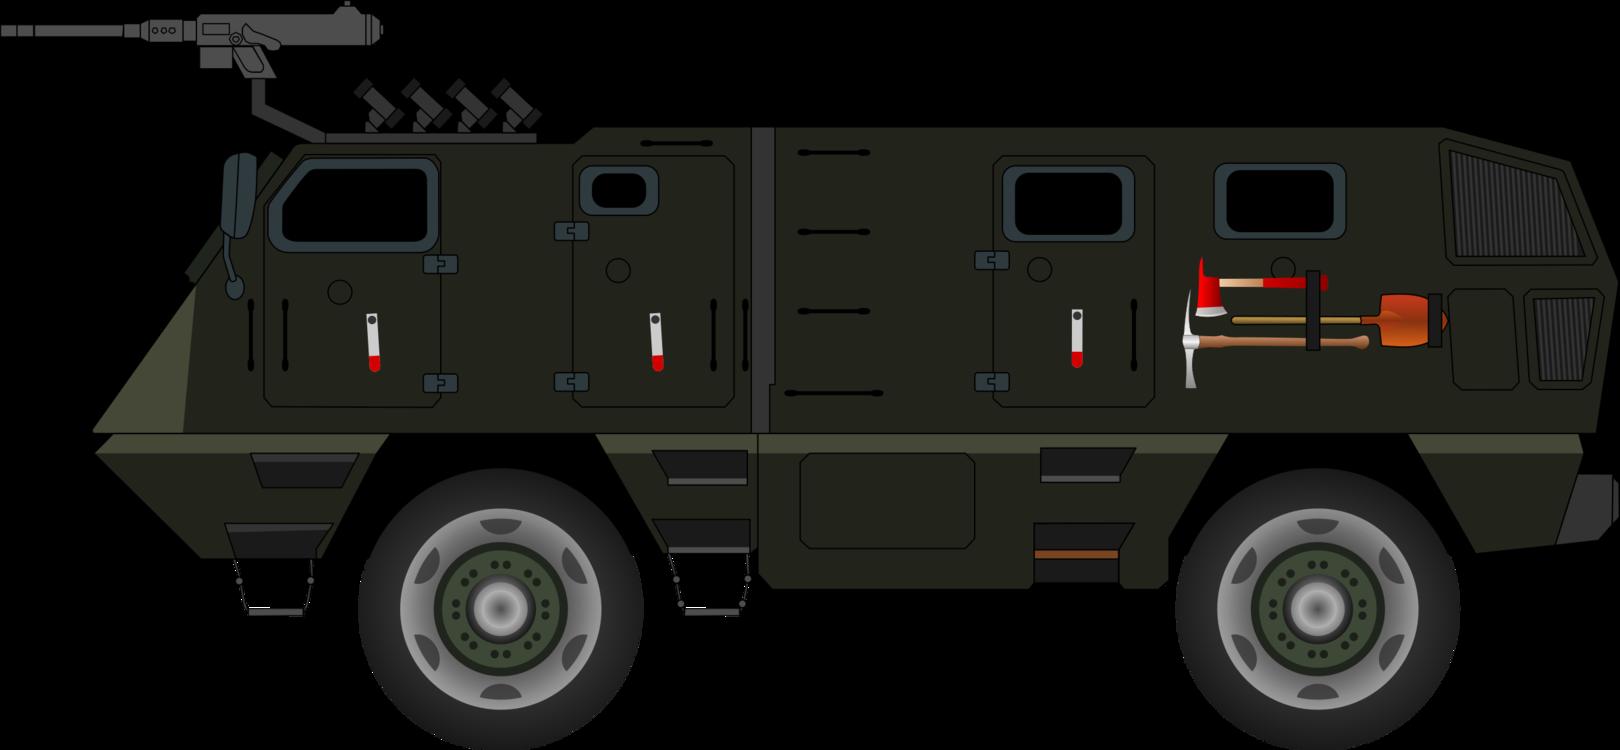 Wheel,Tire,Military Vehicle